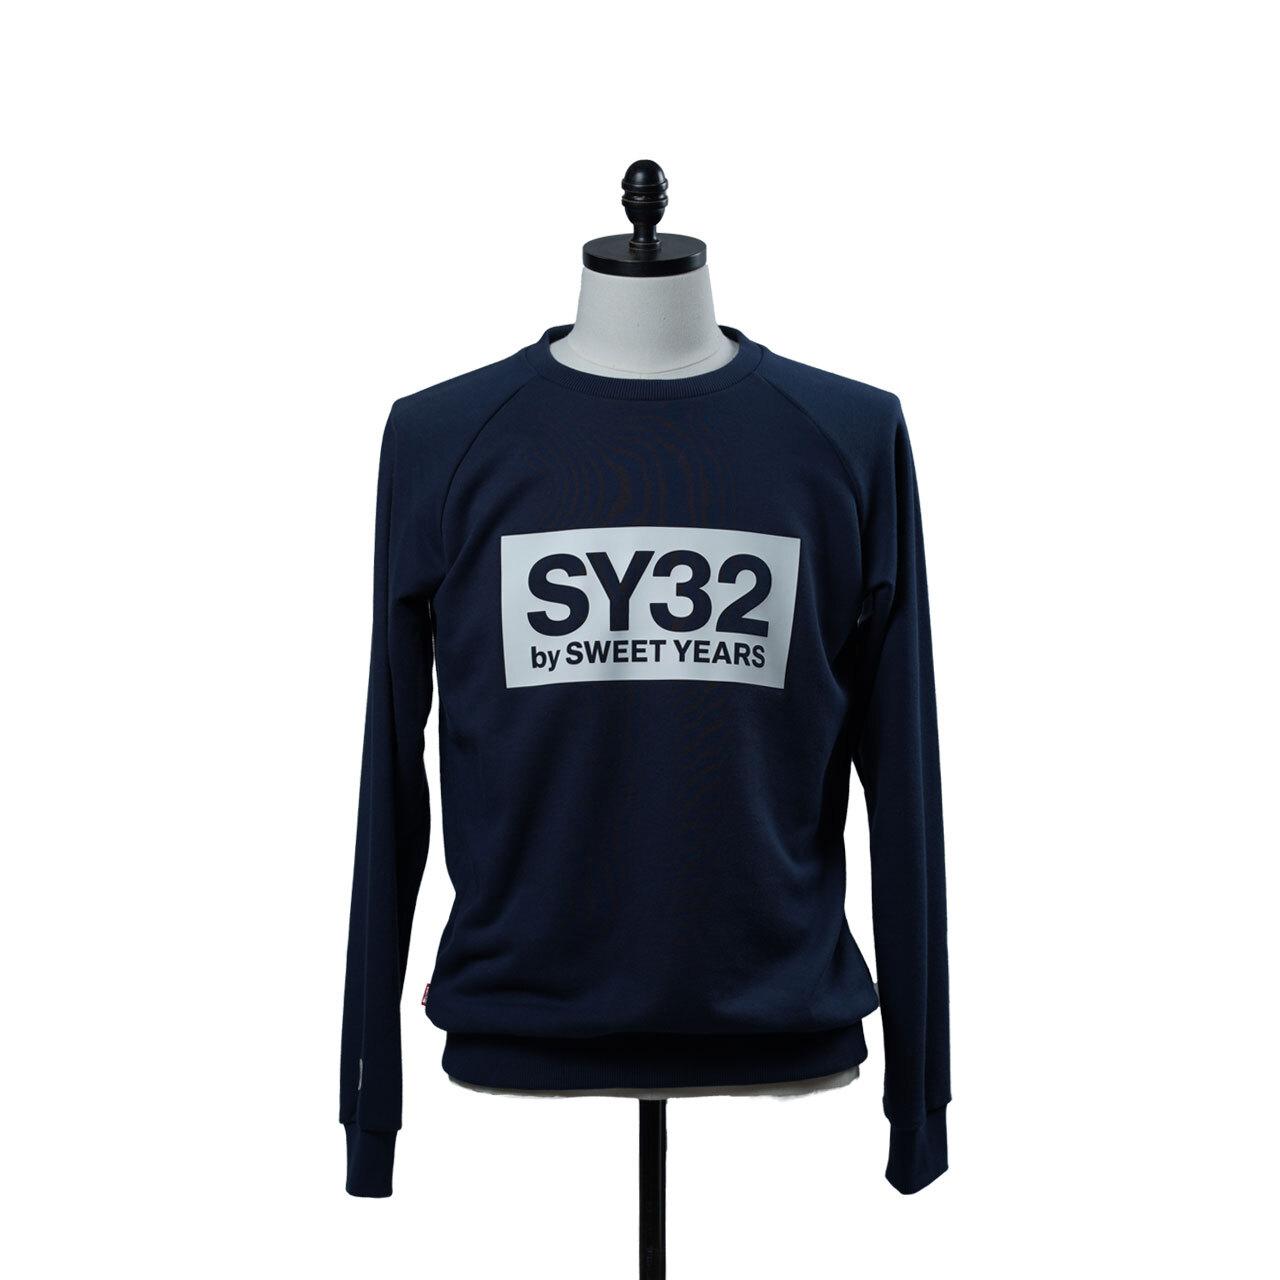 SY32 【レギュラーシリーズ】レギュラーP/Oクルー(TNS1705)